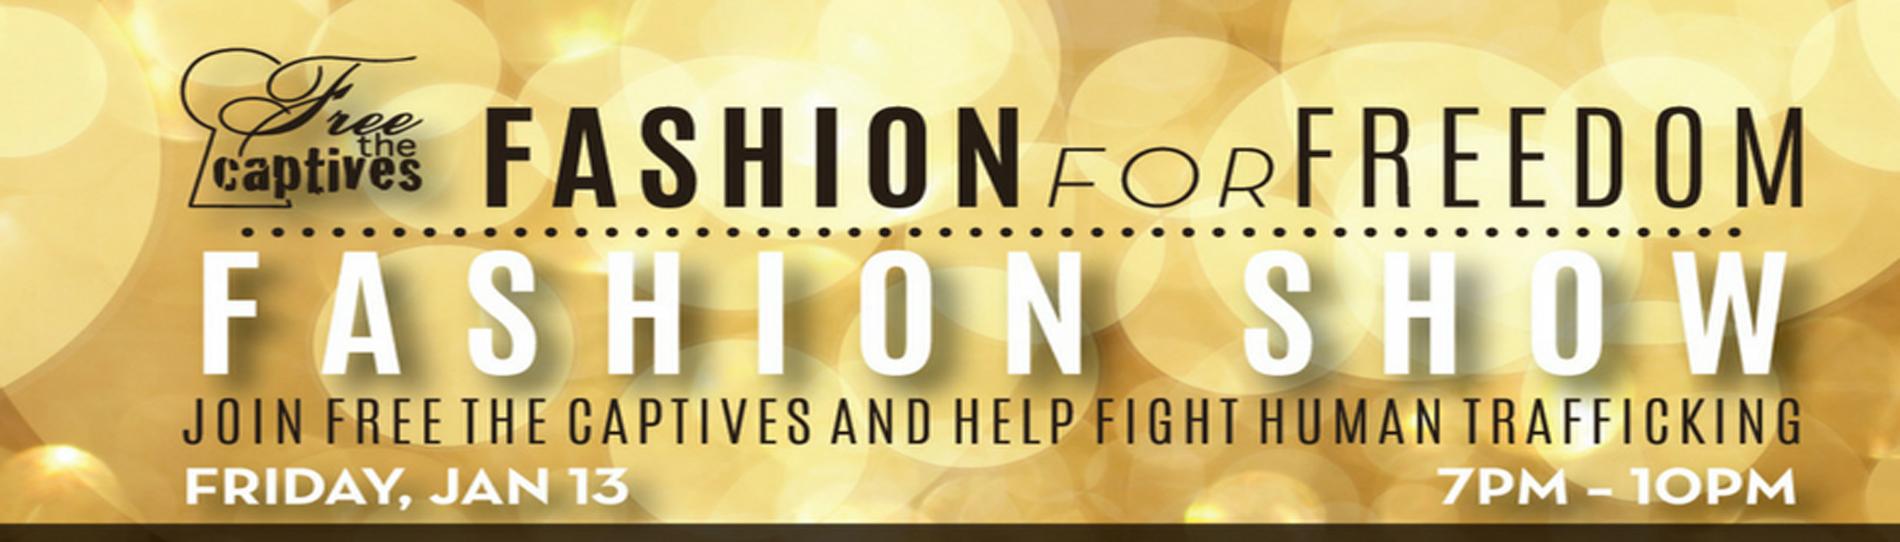 EventMozo Free the Captives' Fashion Show: Fashion for Freedom